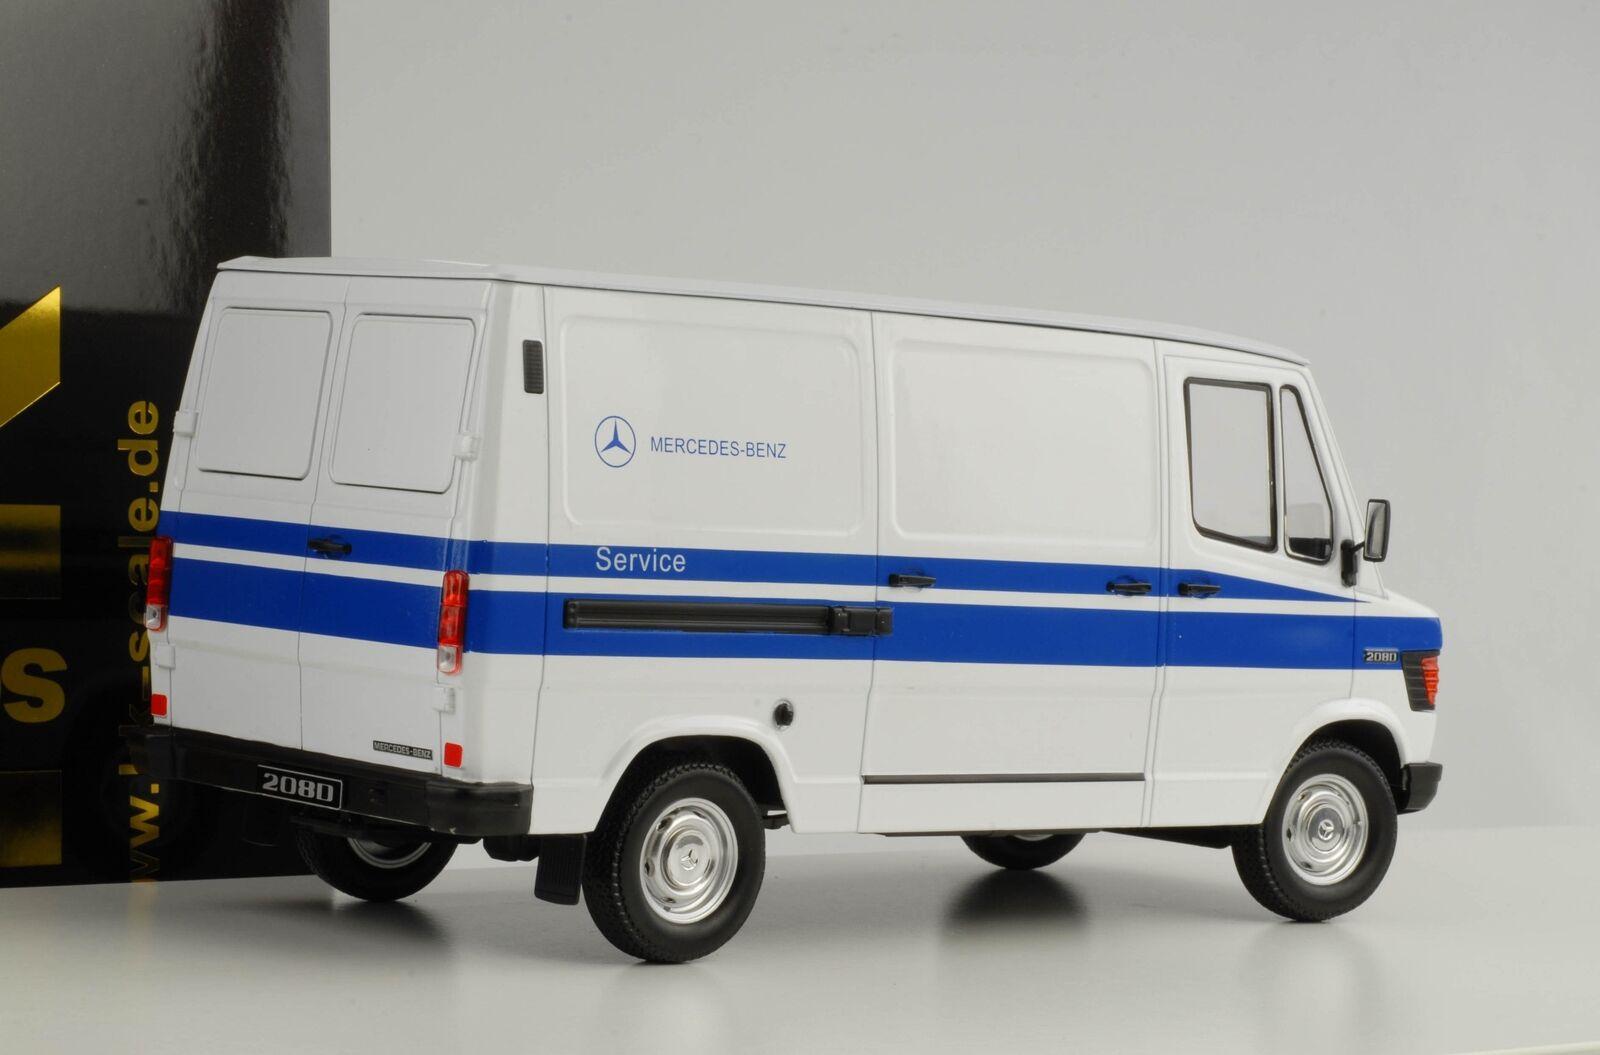 Mercedes-Benz 208 D Bus Caja 1988 Service biancao 1 18 Kk Diecast Nuevo